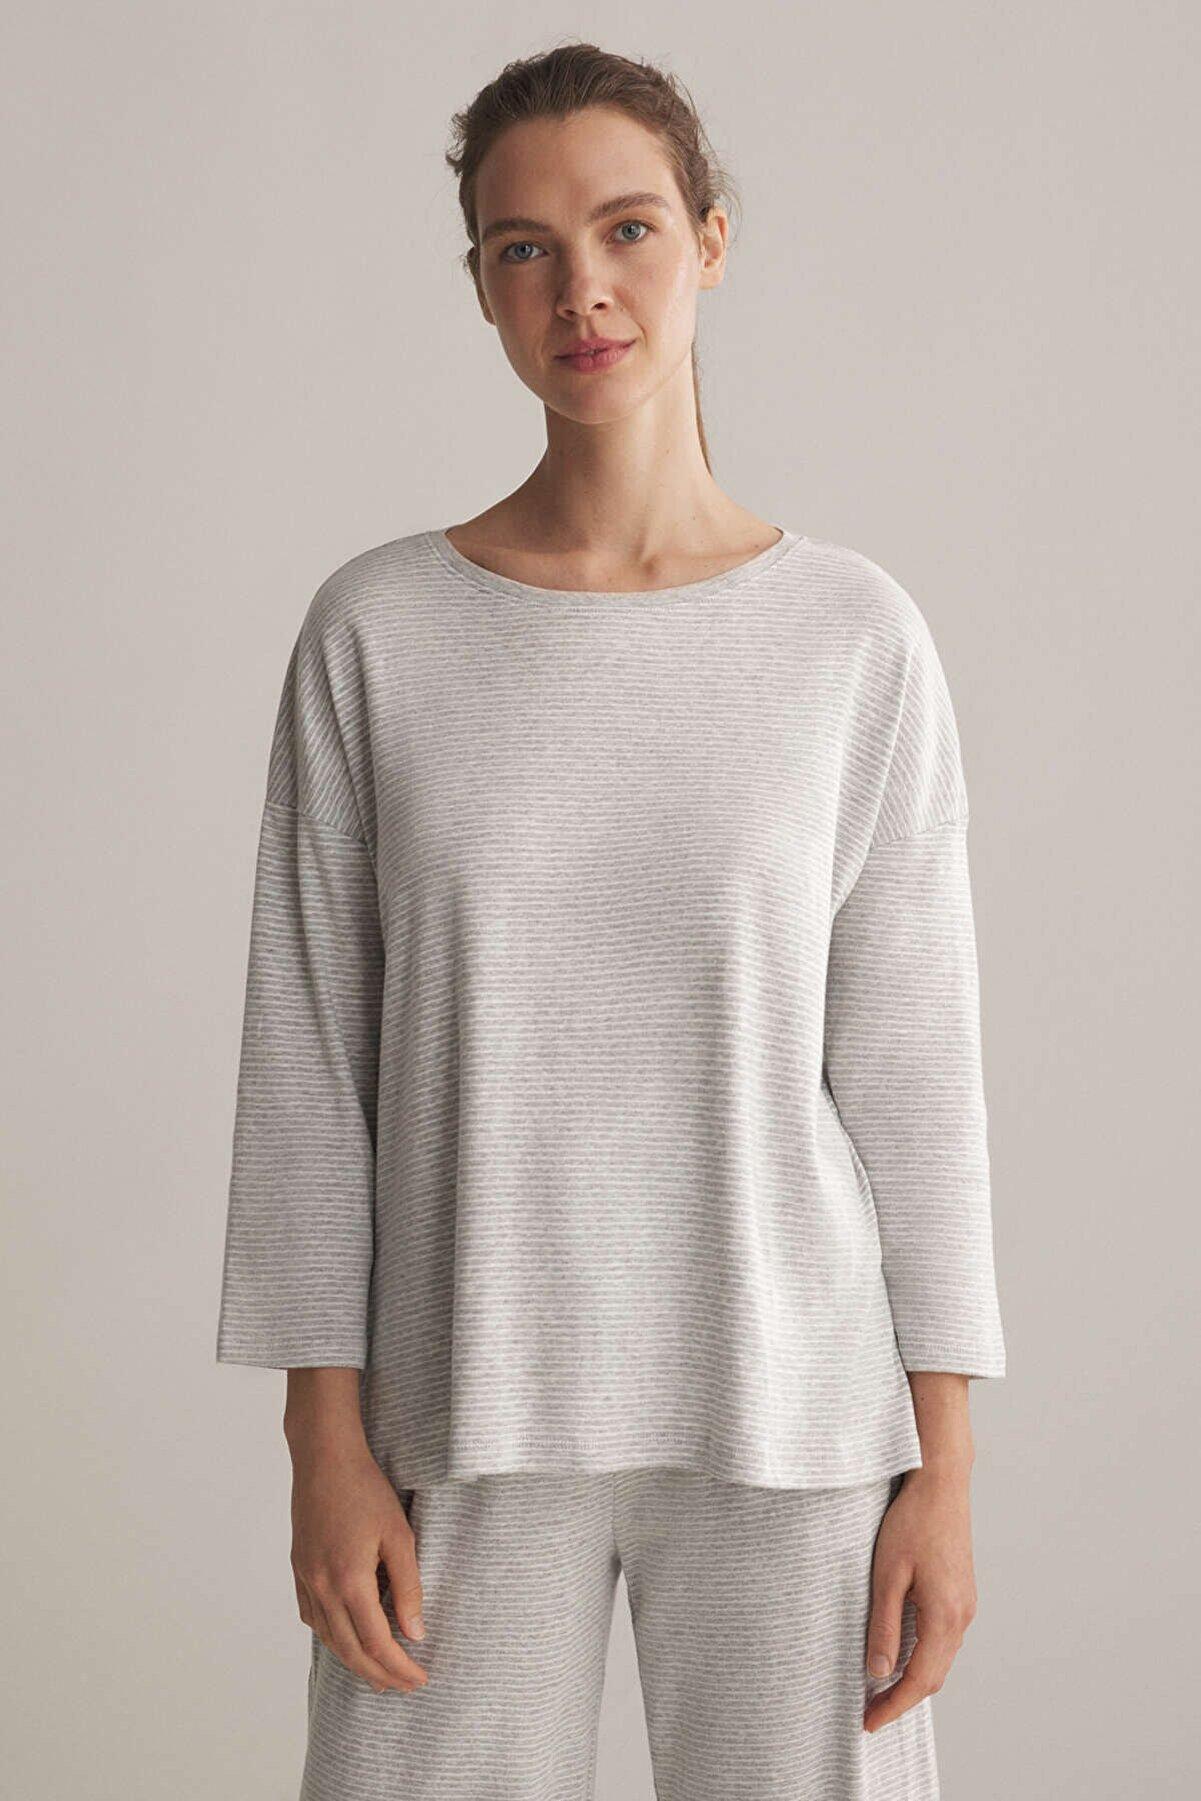 Oysho Kadın Gri Ince Çizgili Pamuklu Tişört